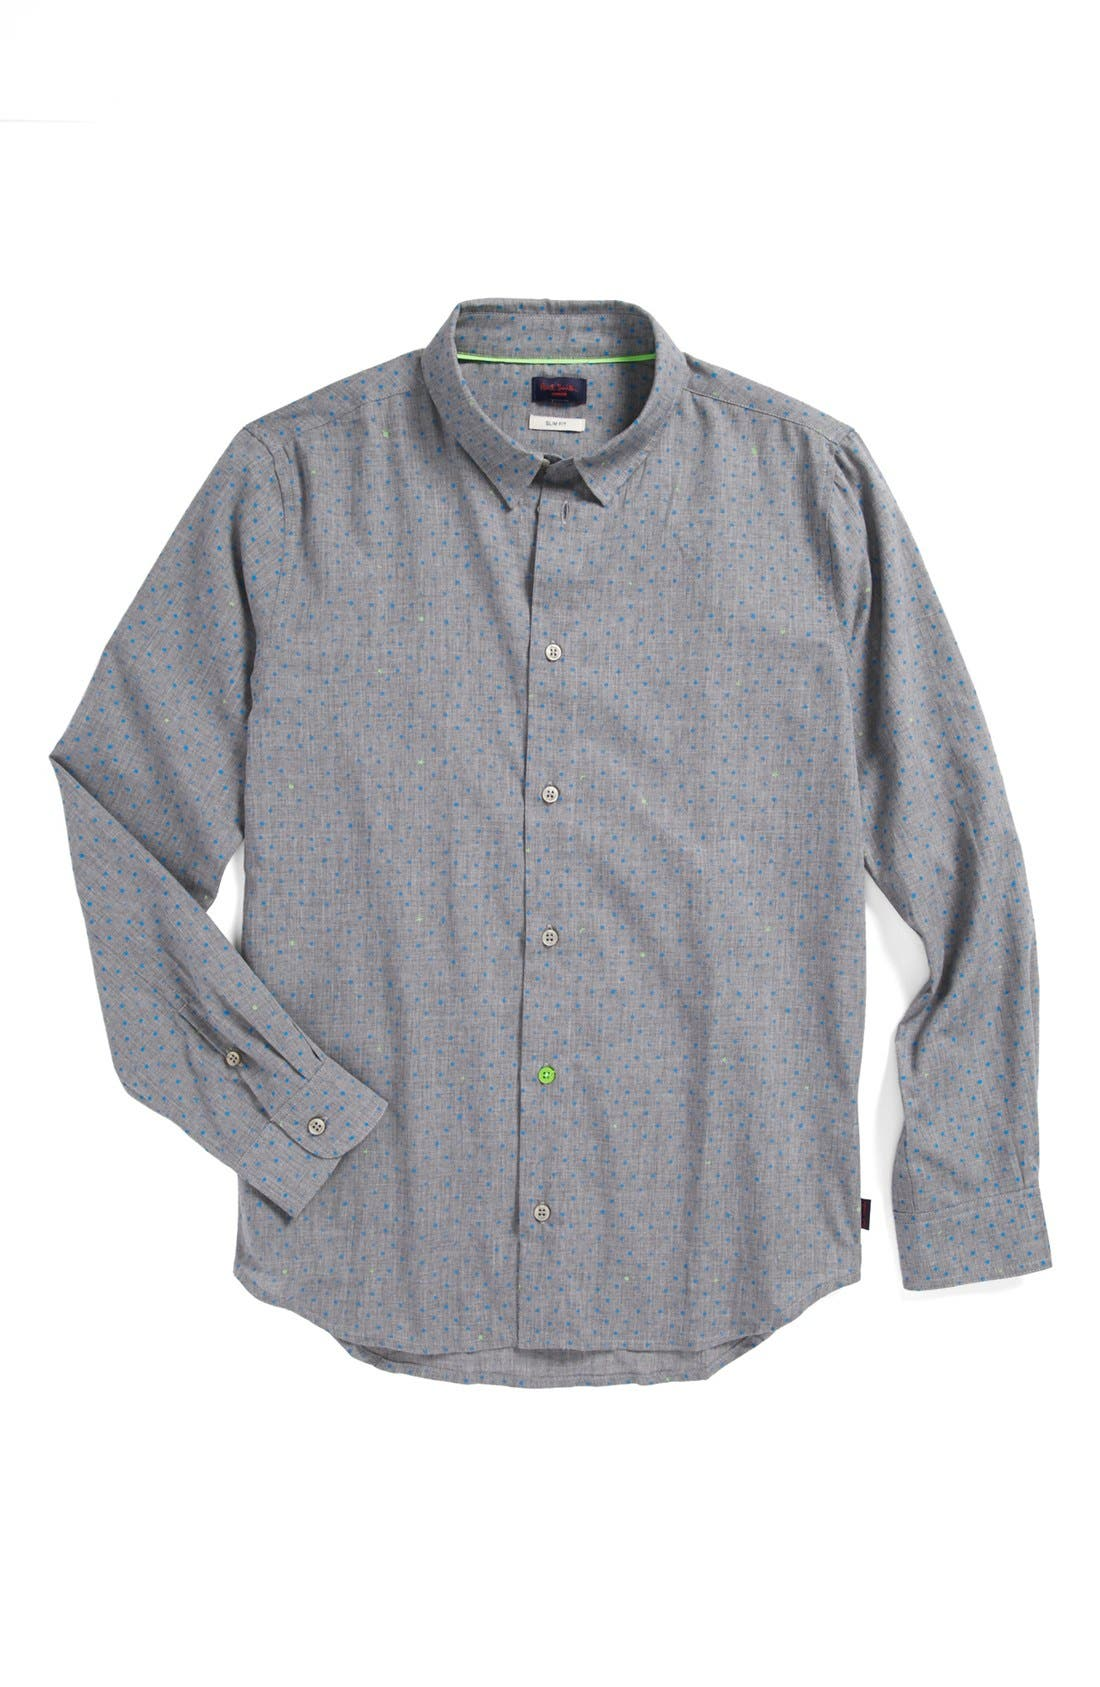 Alternate Image 1 Selected - Paul Smith Junior 'Esteban' Sport Shirt (Toddler Boys, Little Boys & Big Boys)